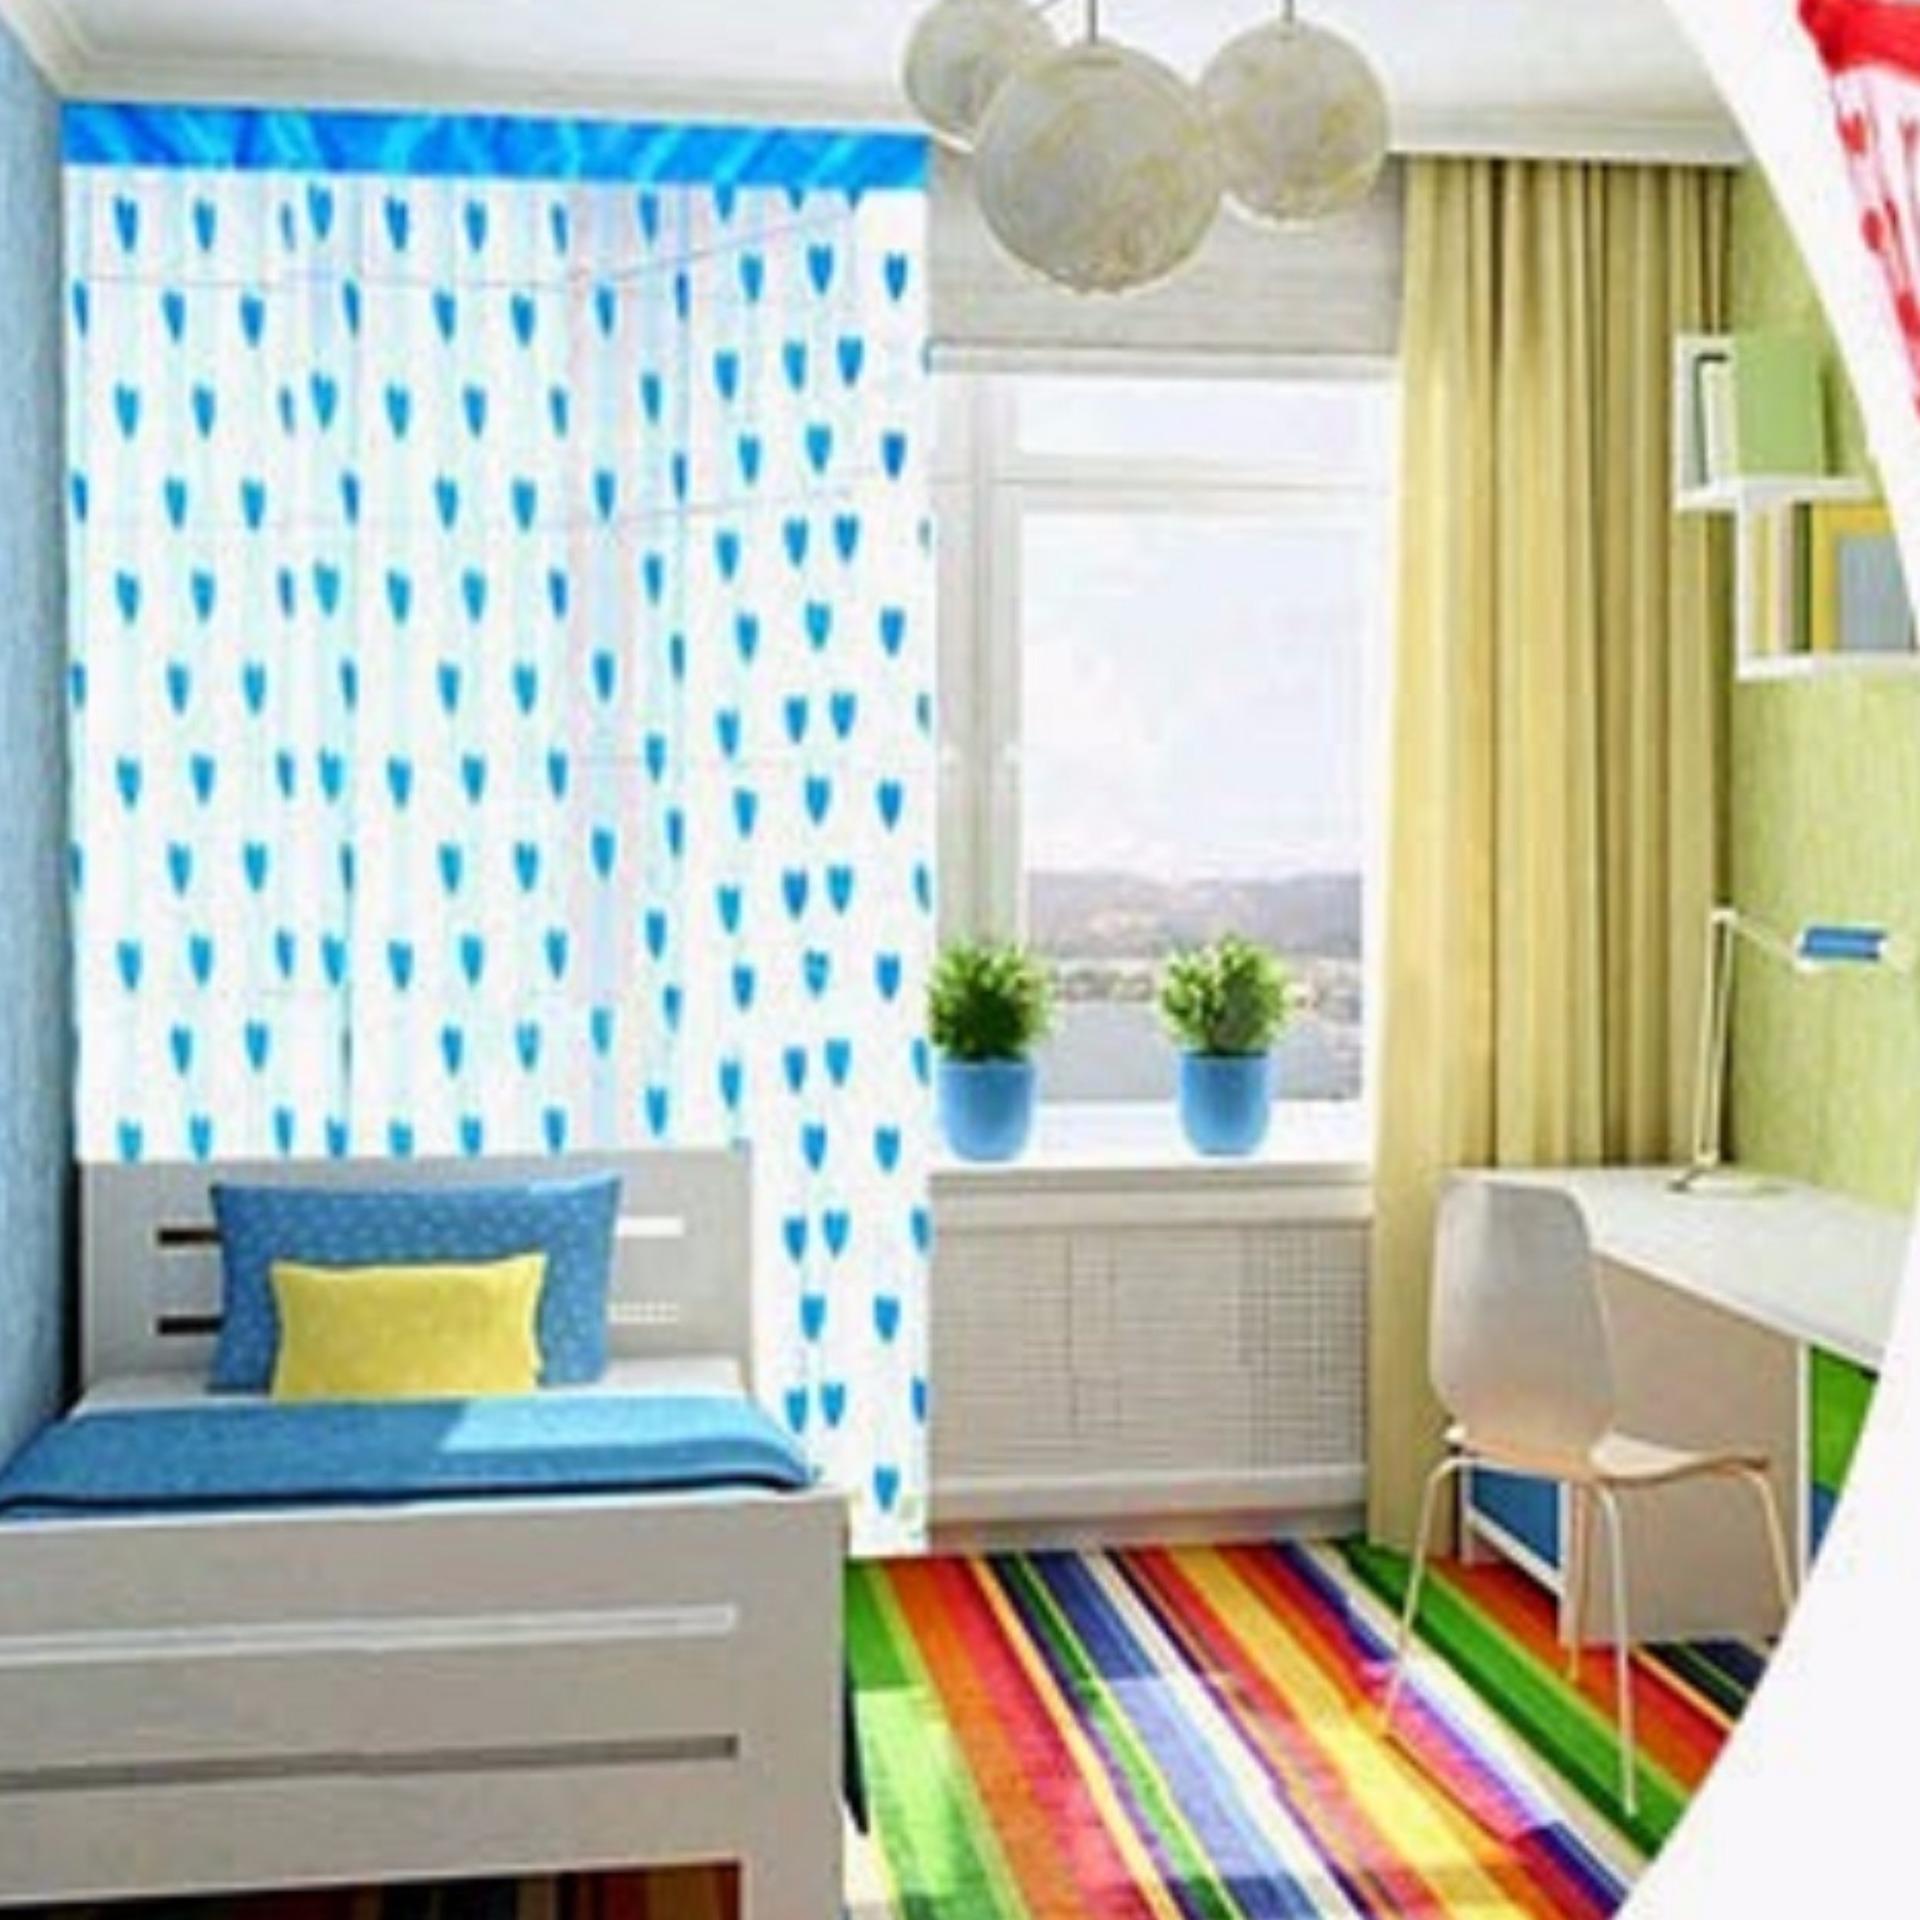 Hijau Mawar88shop Daftar Update Source Mawar88shop Tirai Benang Motif Love satu warna Lazada .